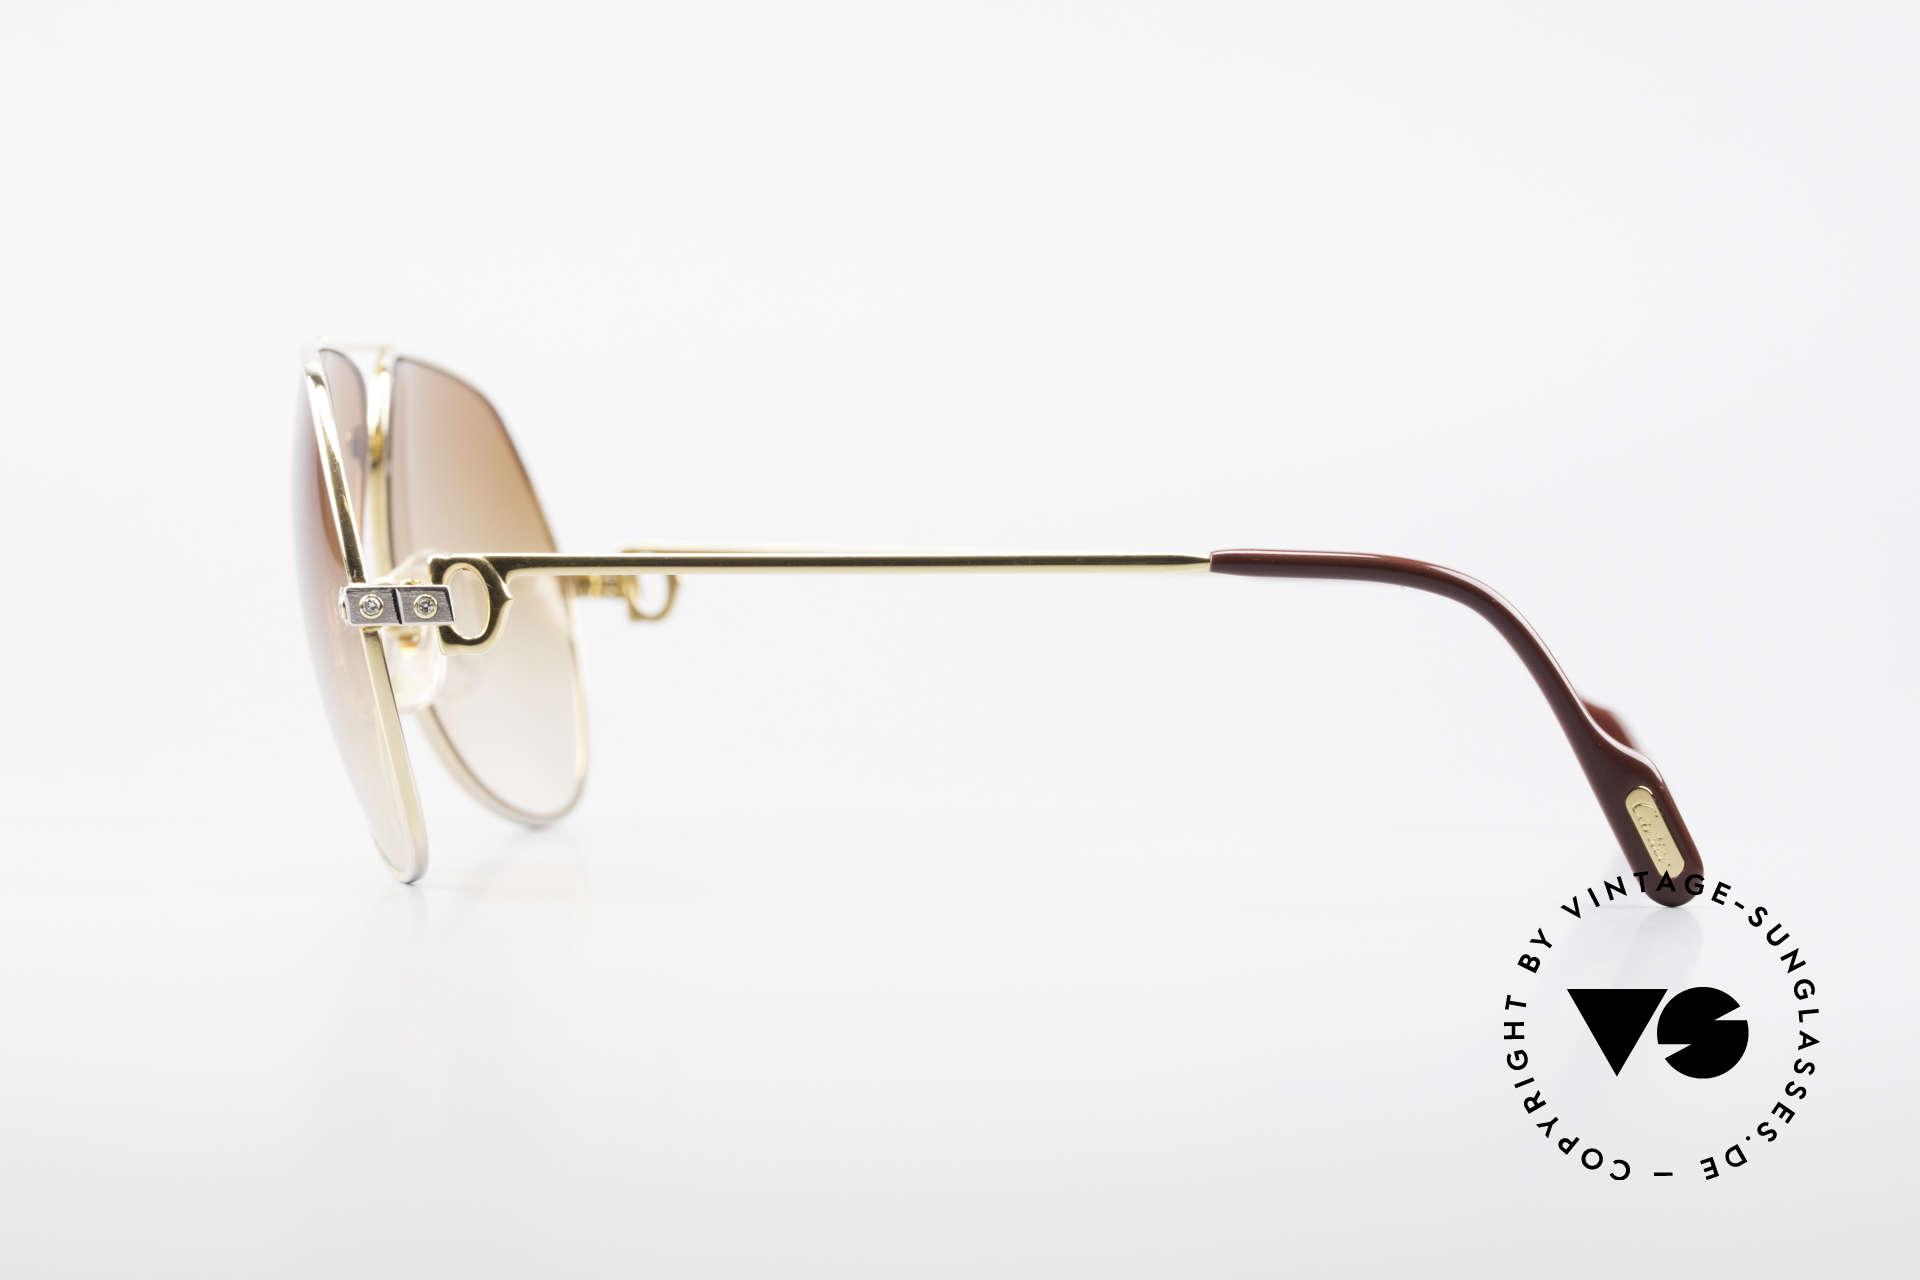 Cartier Vendome Santos - L Customized Diamond Shades, moreover with orig. Cartier sun lenses (with Cartier logo), Made for Men